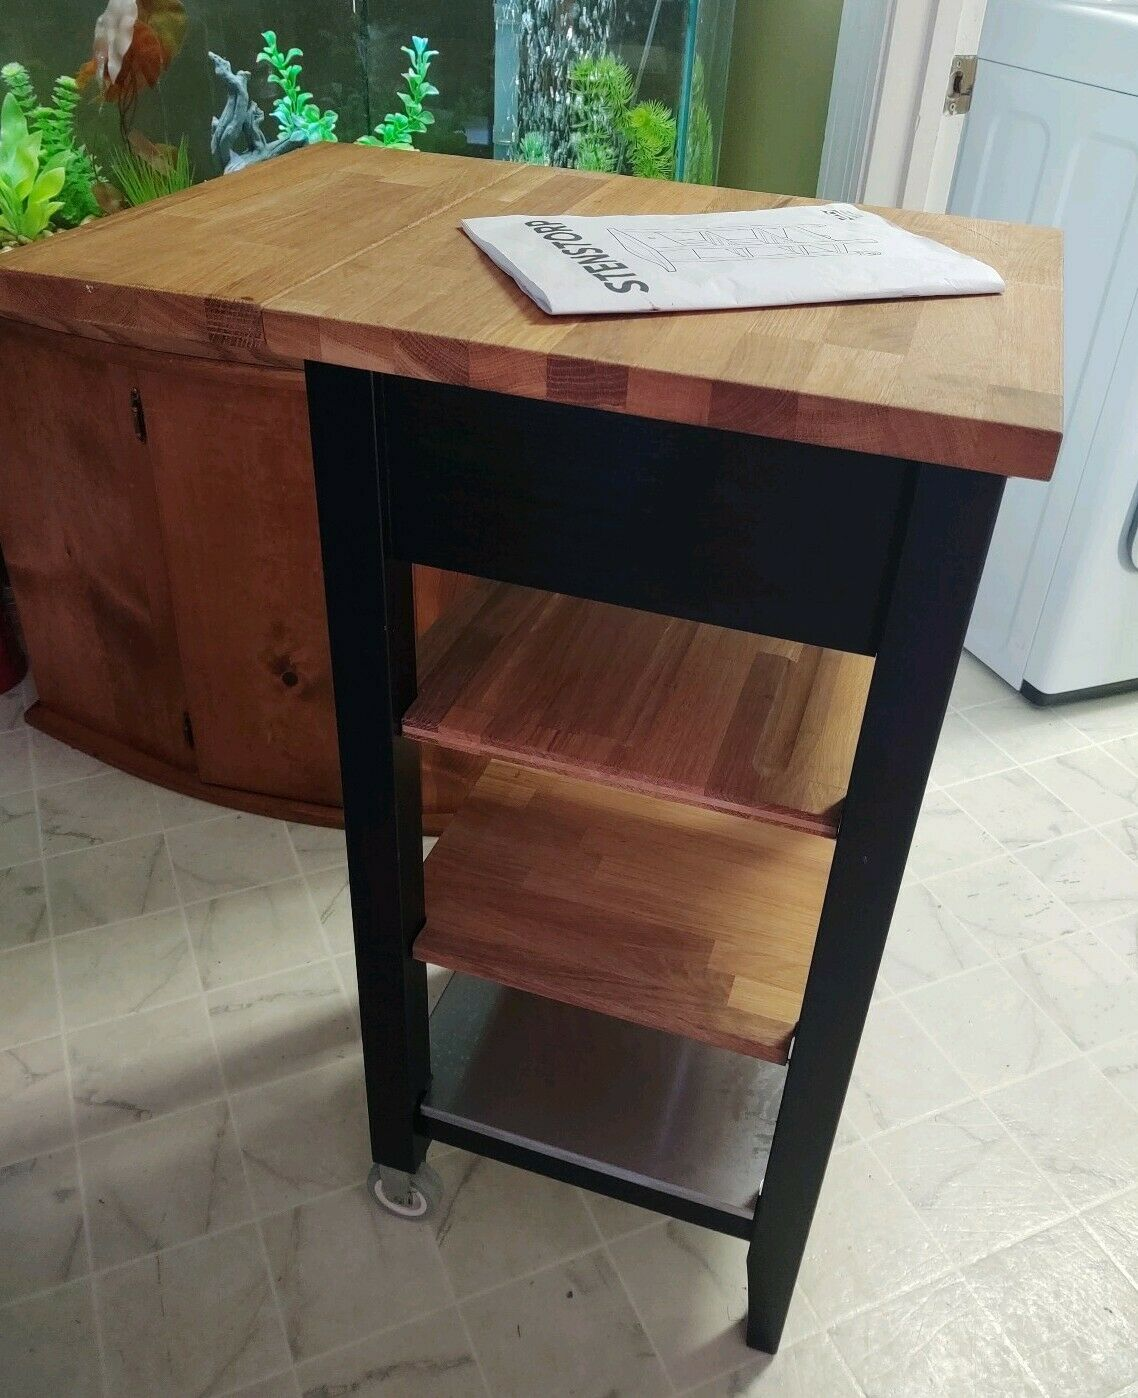 IKEA Stenstorp Kitchen Cart Black Oak Stainless Steel - Kitchen Island